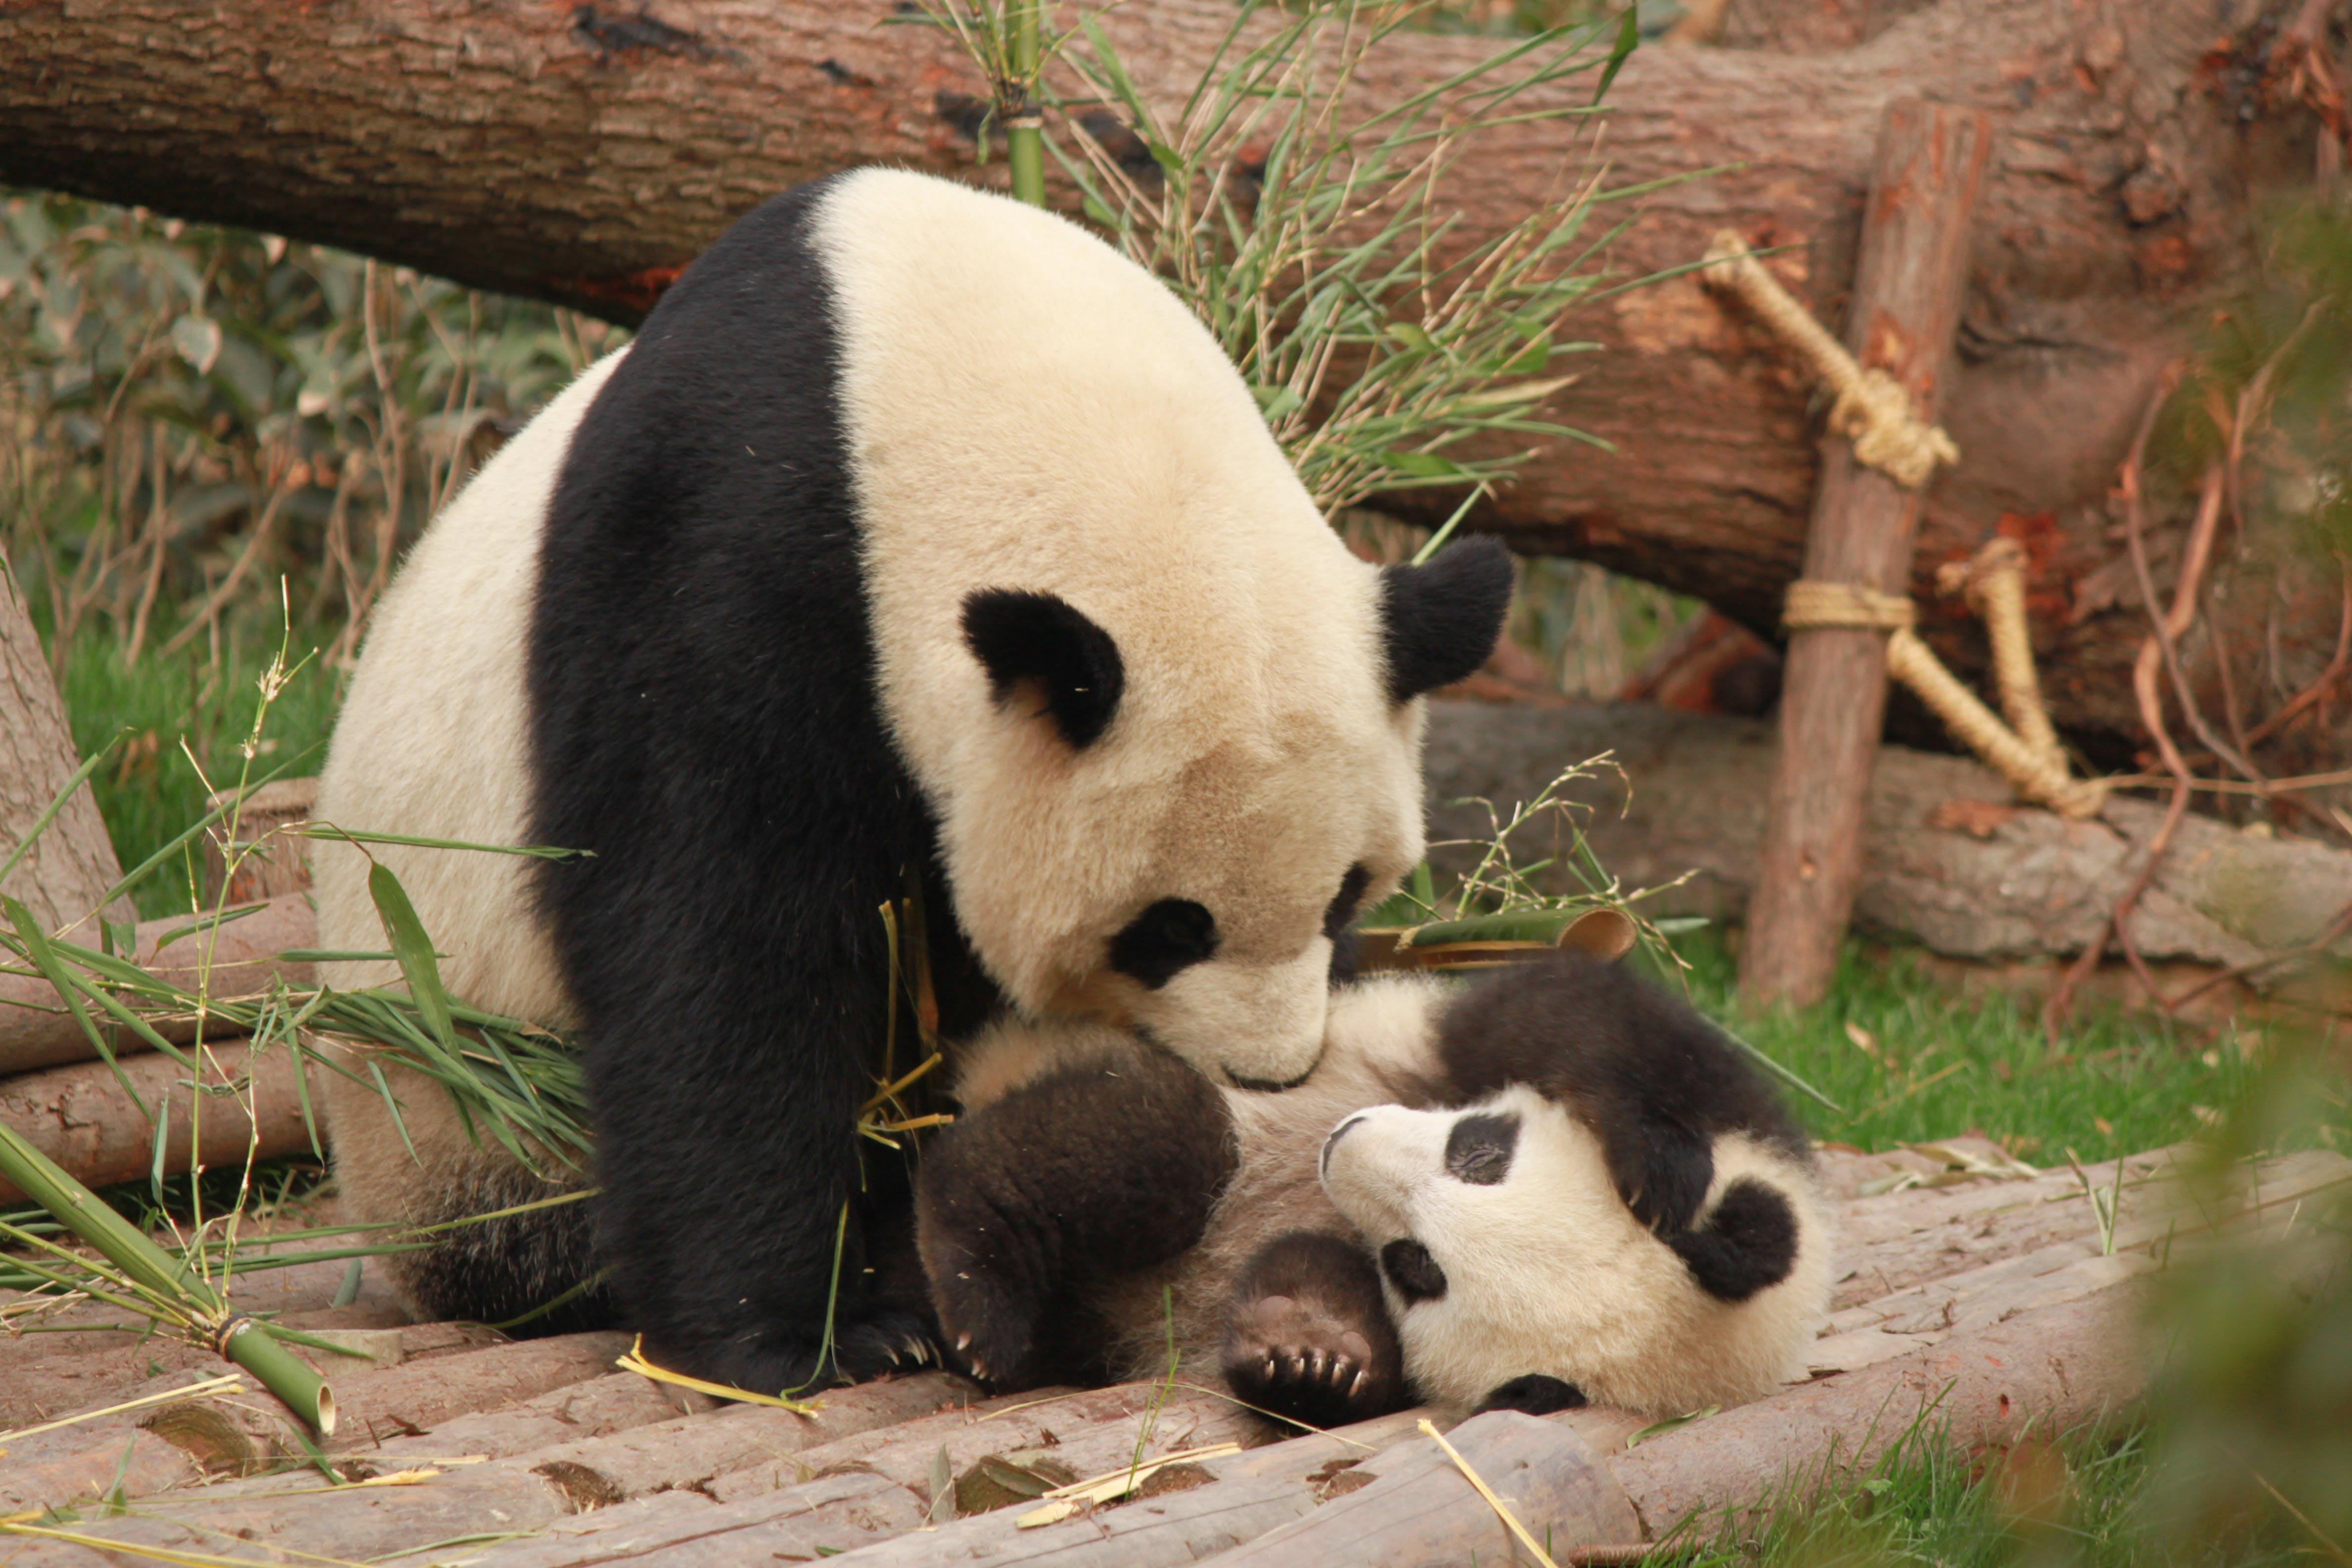 Photo of Panda and Cub Playing